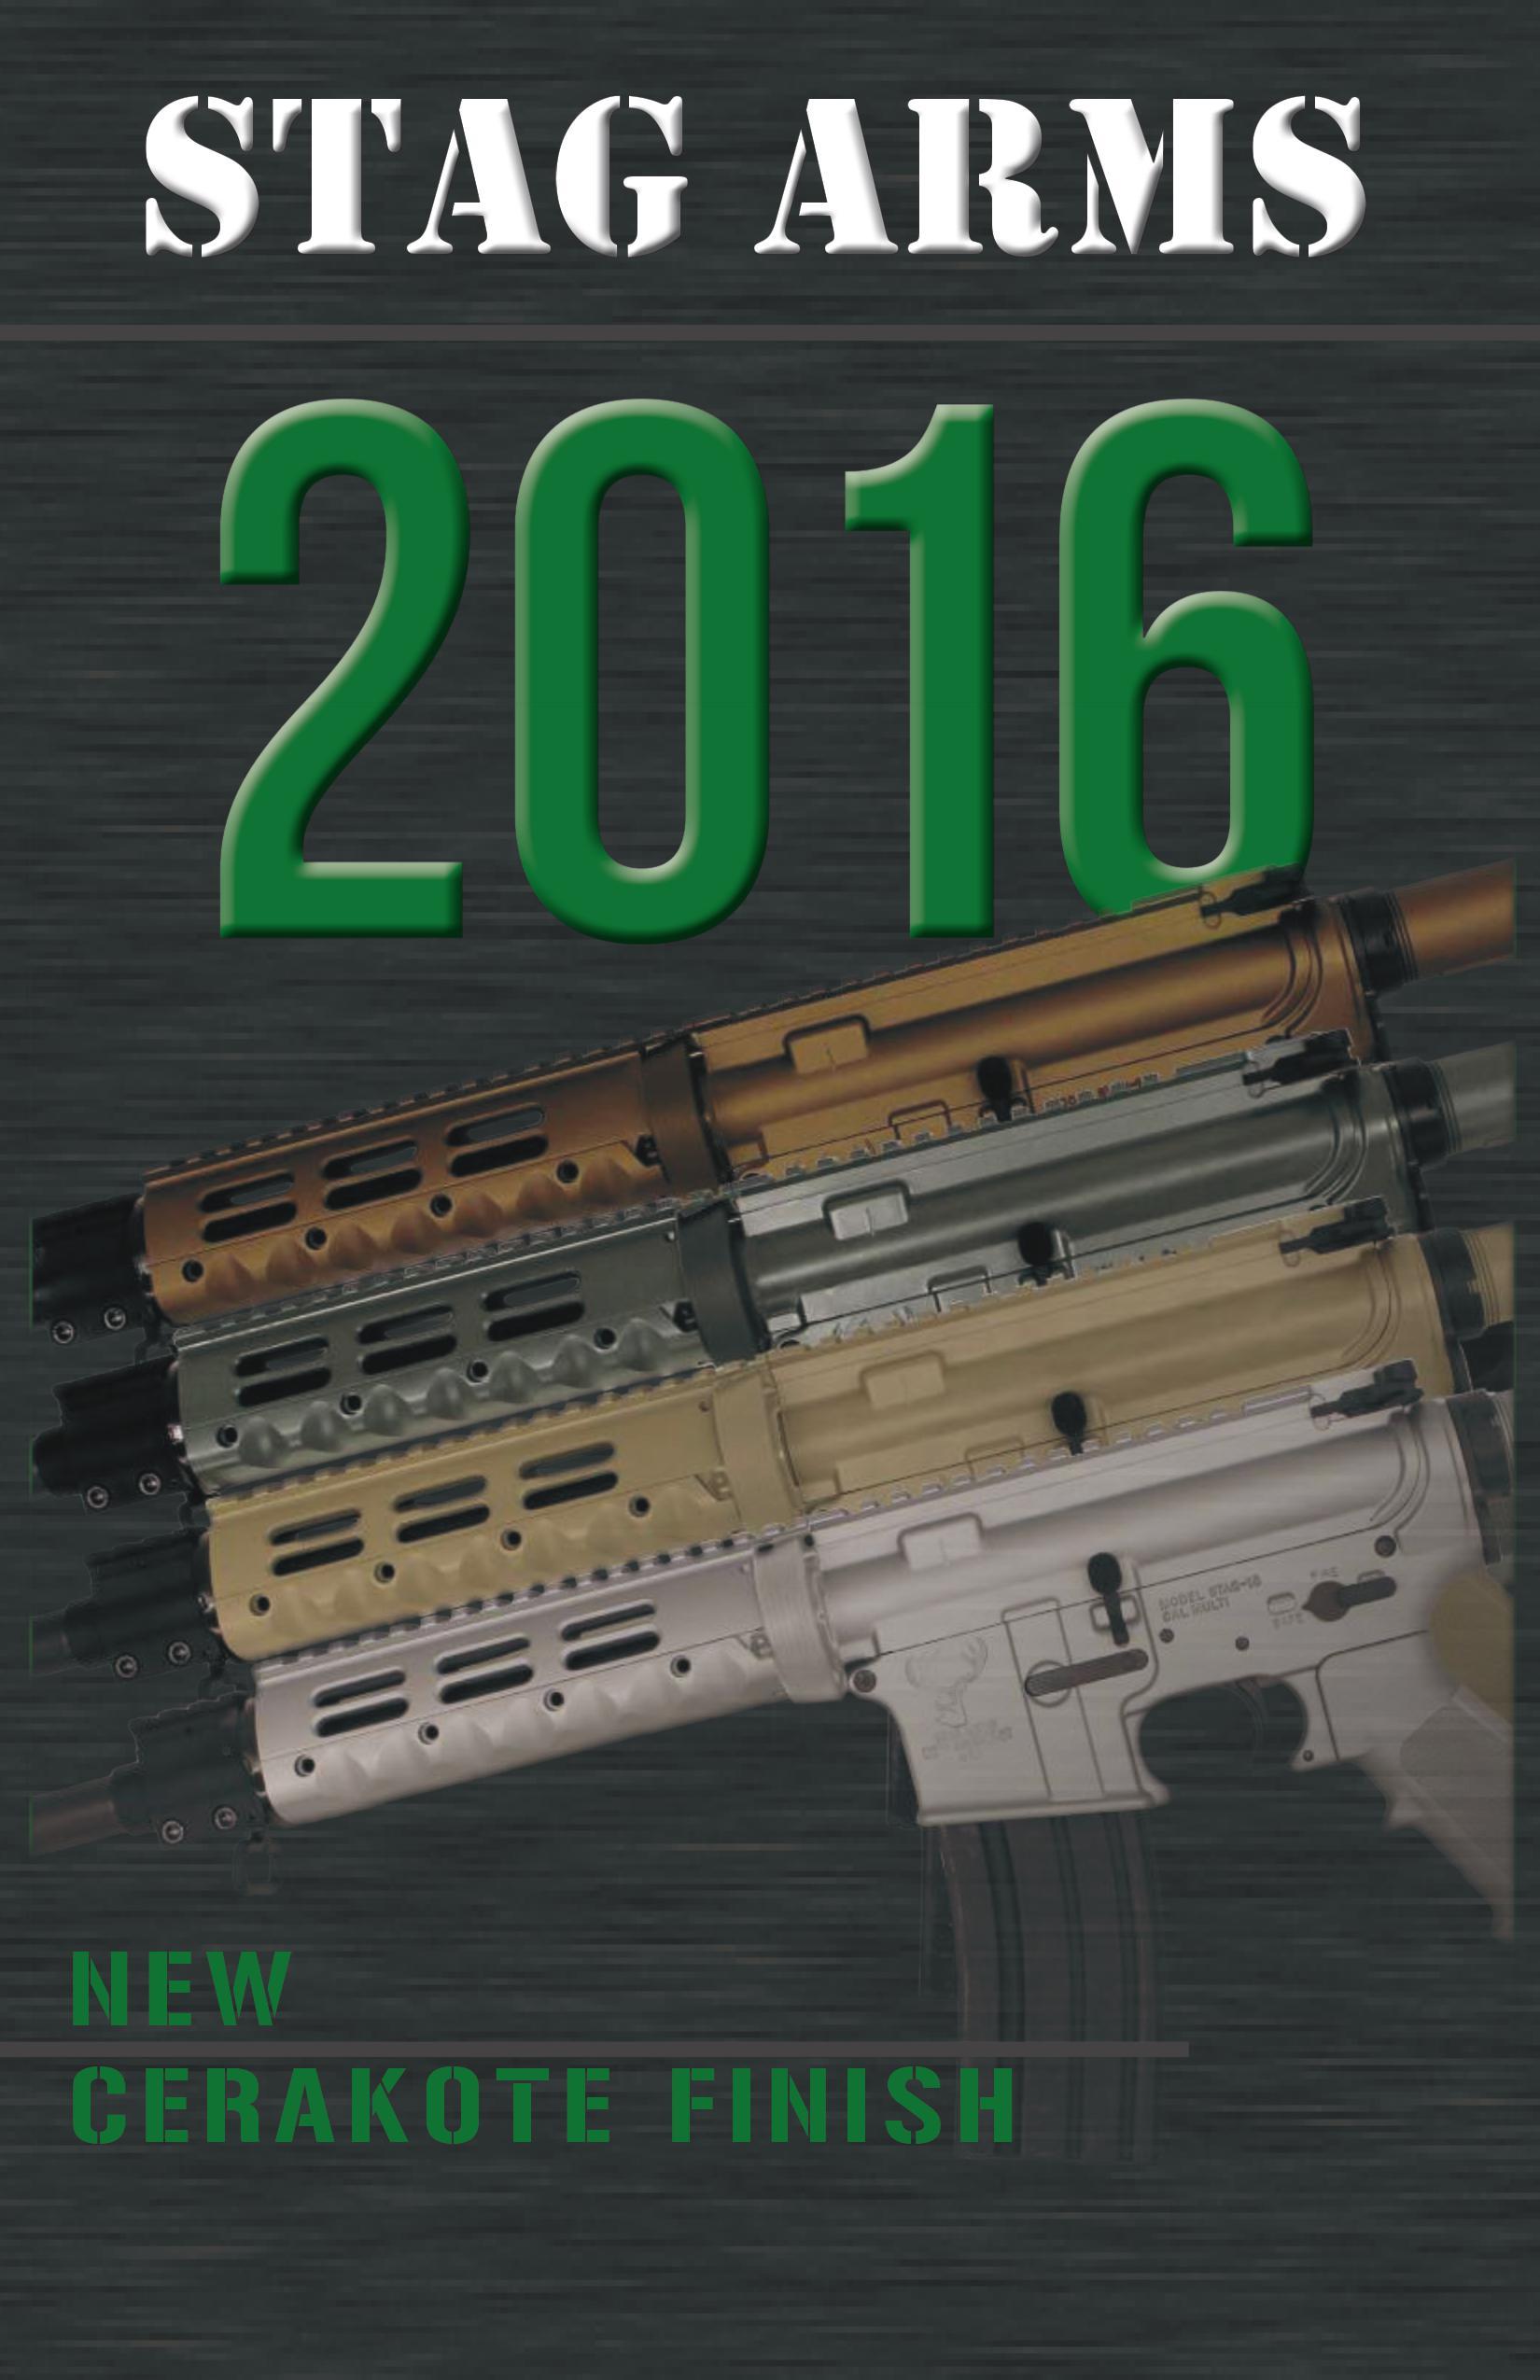 Stag-2016-catalog-cover.jpg